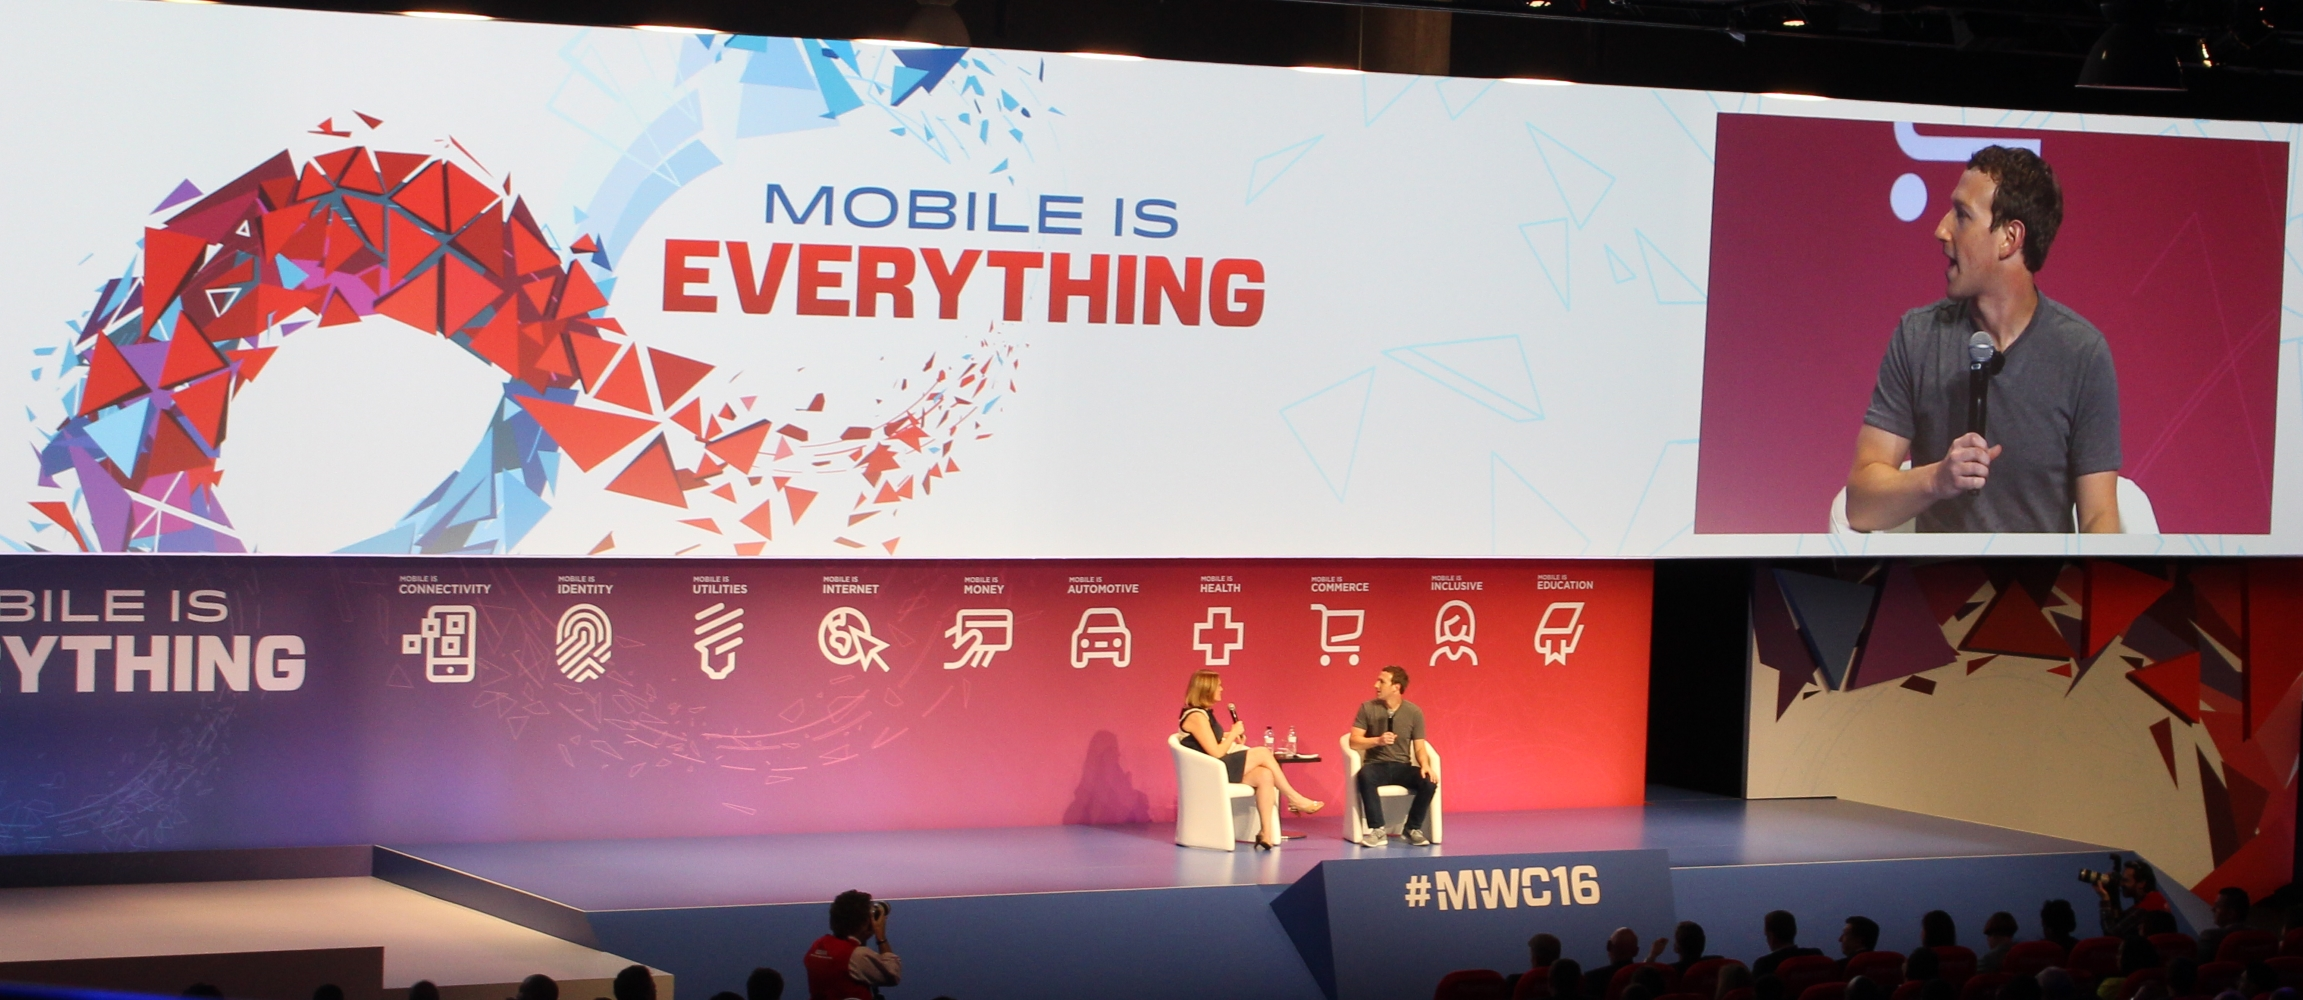 Zuckerberg at MWC: